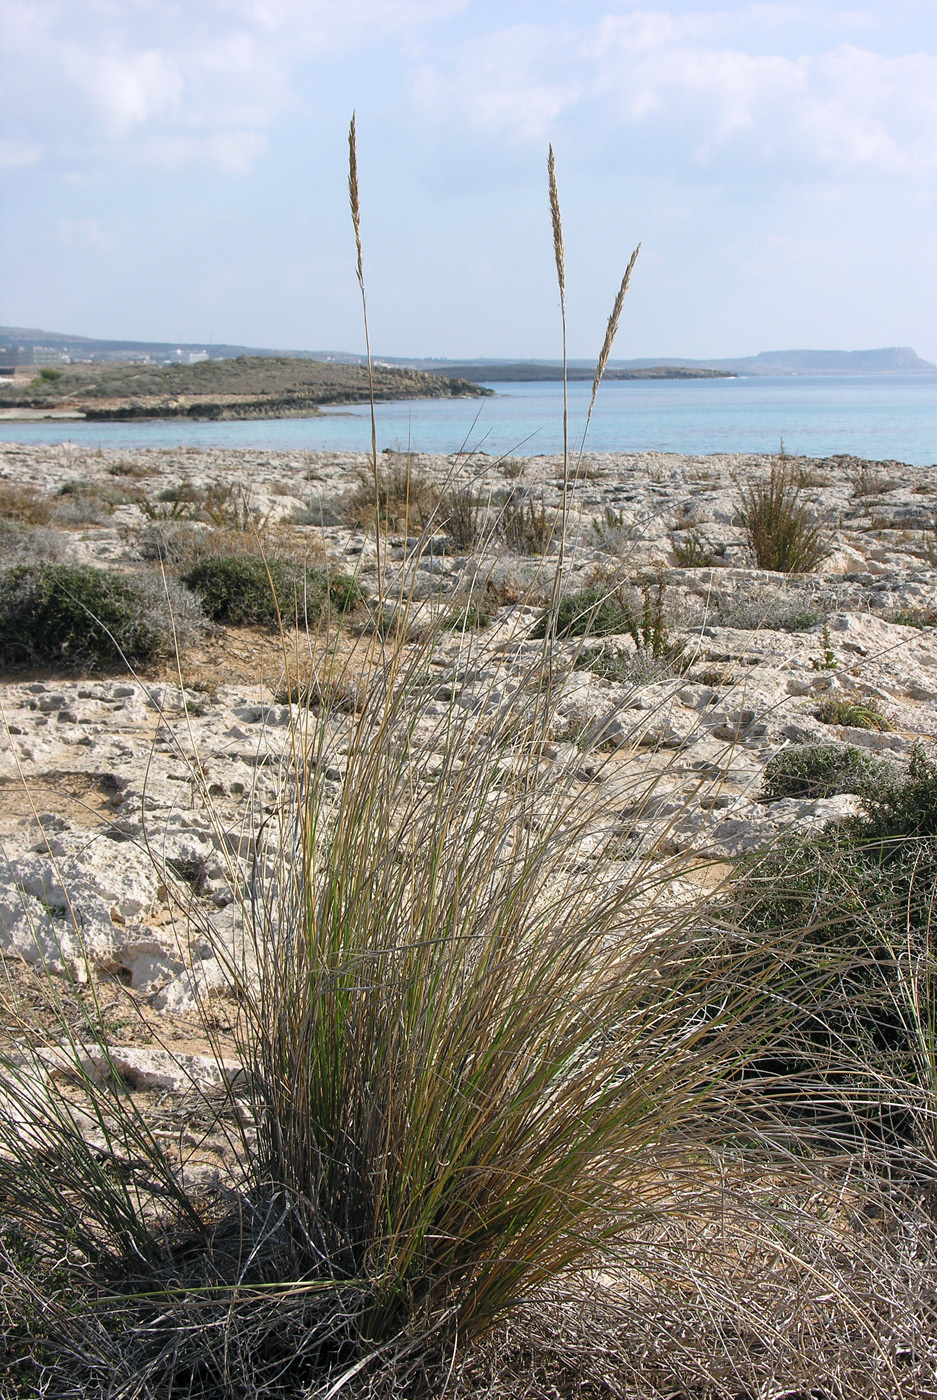 https://pictures.bgbm.org/digilib/Scaler?fn=Cyprus/Ammophila_arenaria_A1.jpg&mo=file